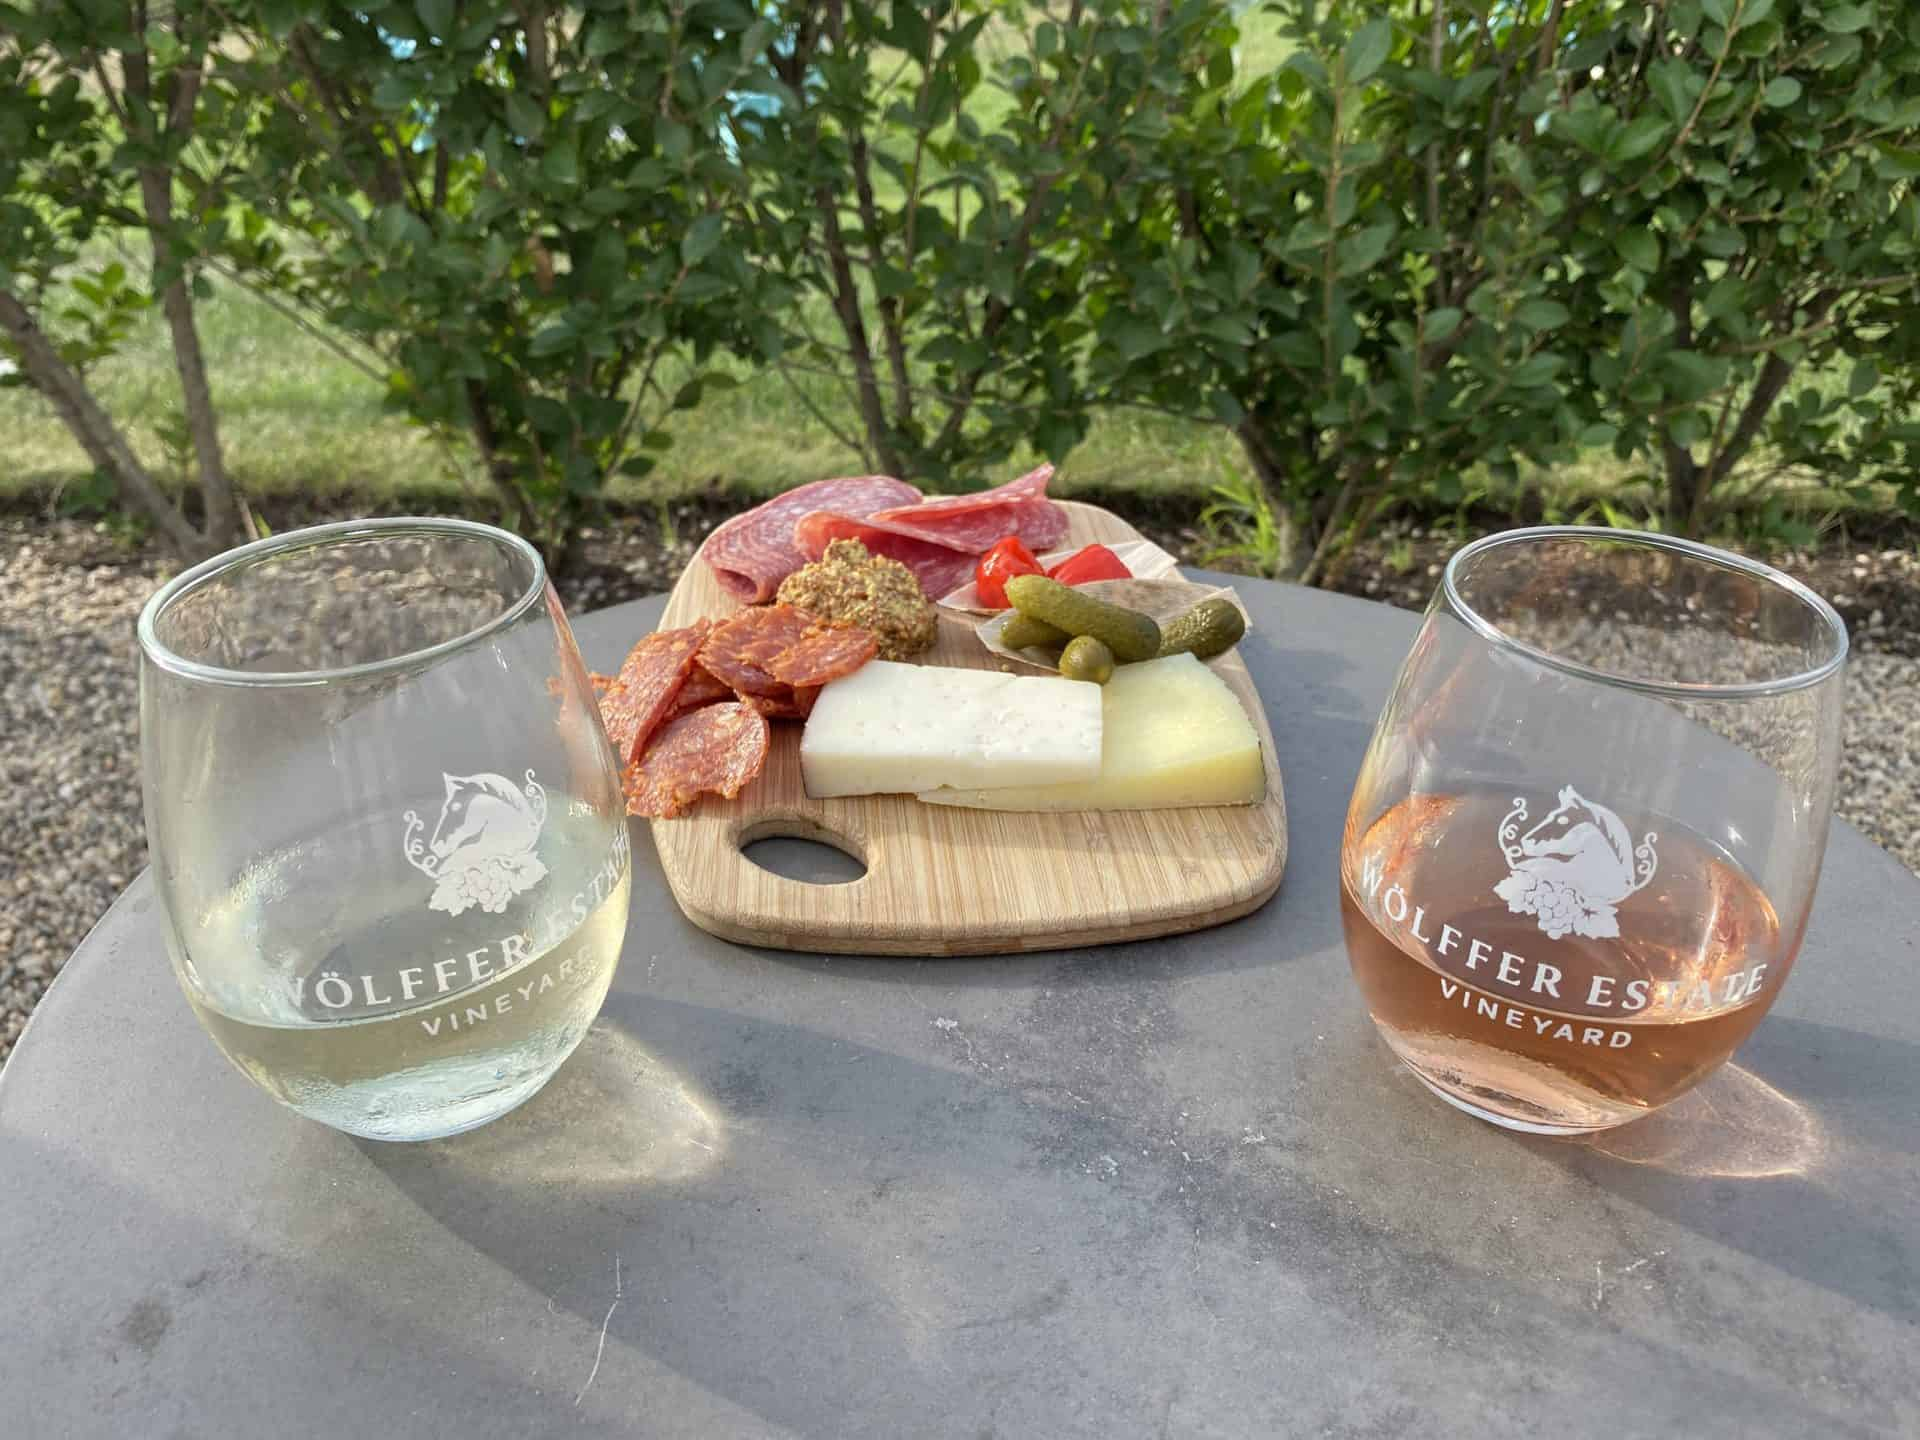 Wolffer Winestand